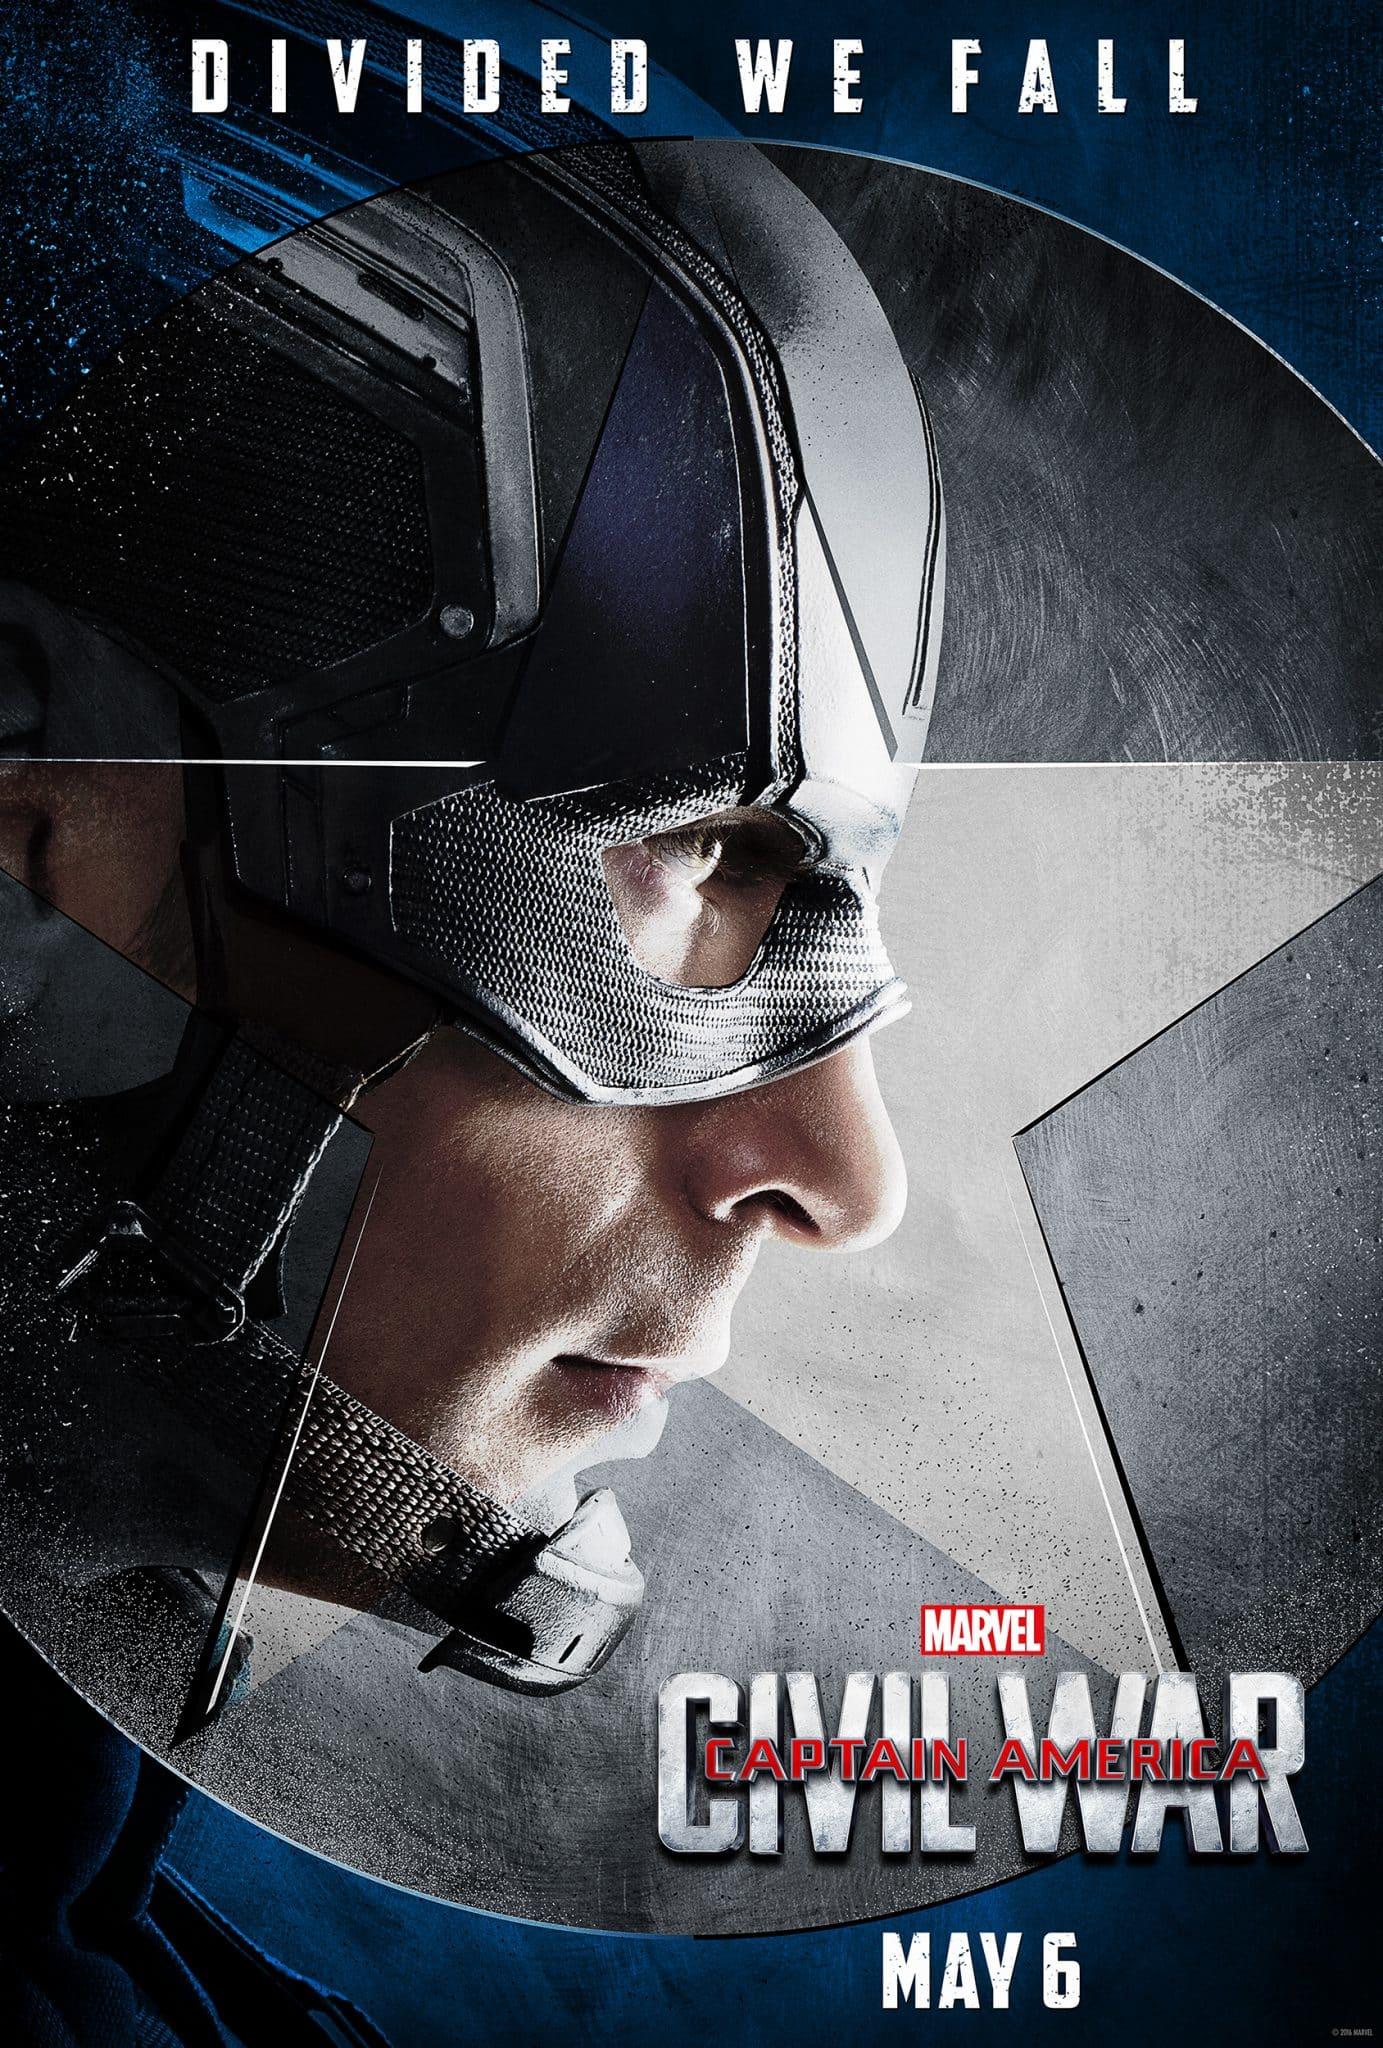 Chris Evans Poster